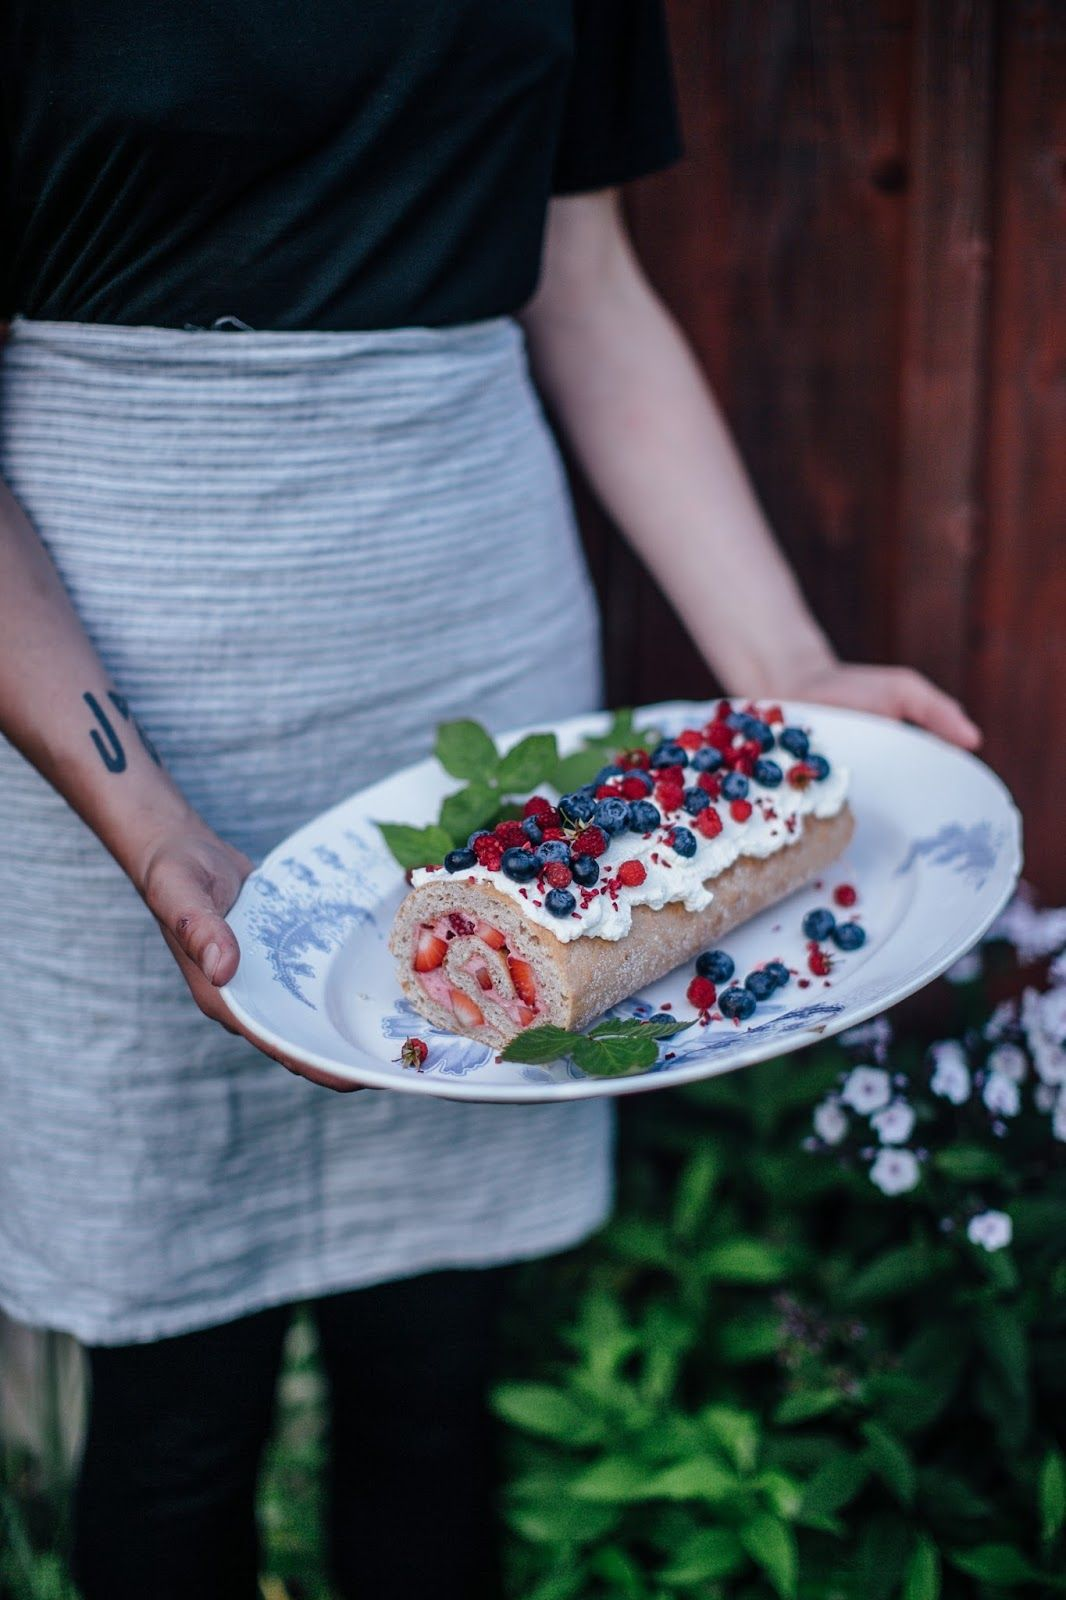 http://www.ourfoodstories.com/2016/08/glutenfree-raspberry-strawberry-swiss.html